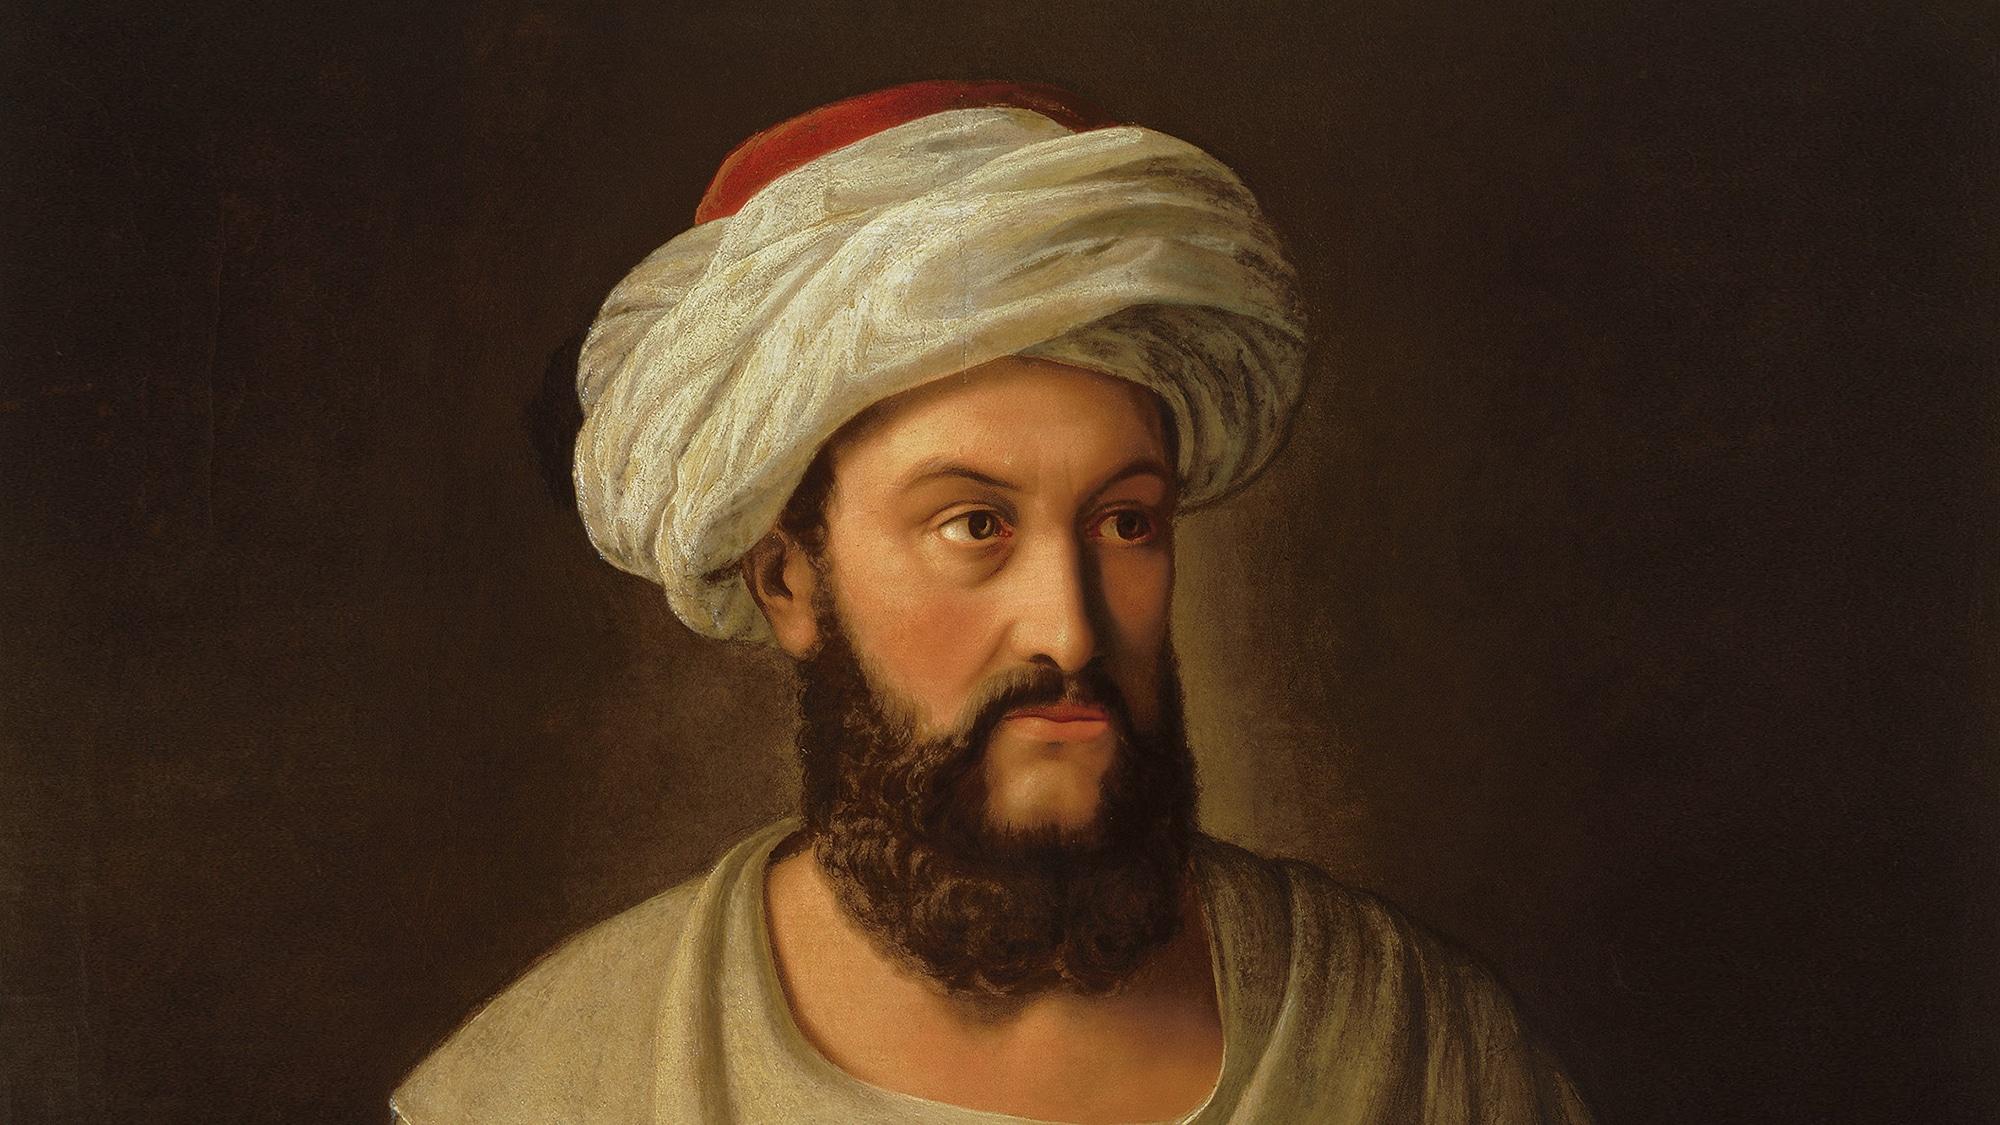 Der Basler Kaufmannssohn Johann Ludwig Burckhardt als indischer Kaufmann Ibrahim ibn Abdallah.